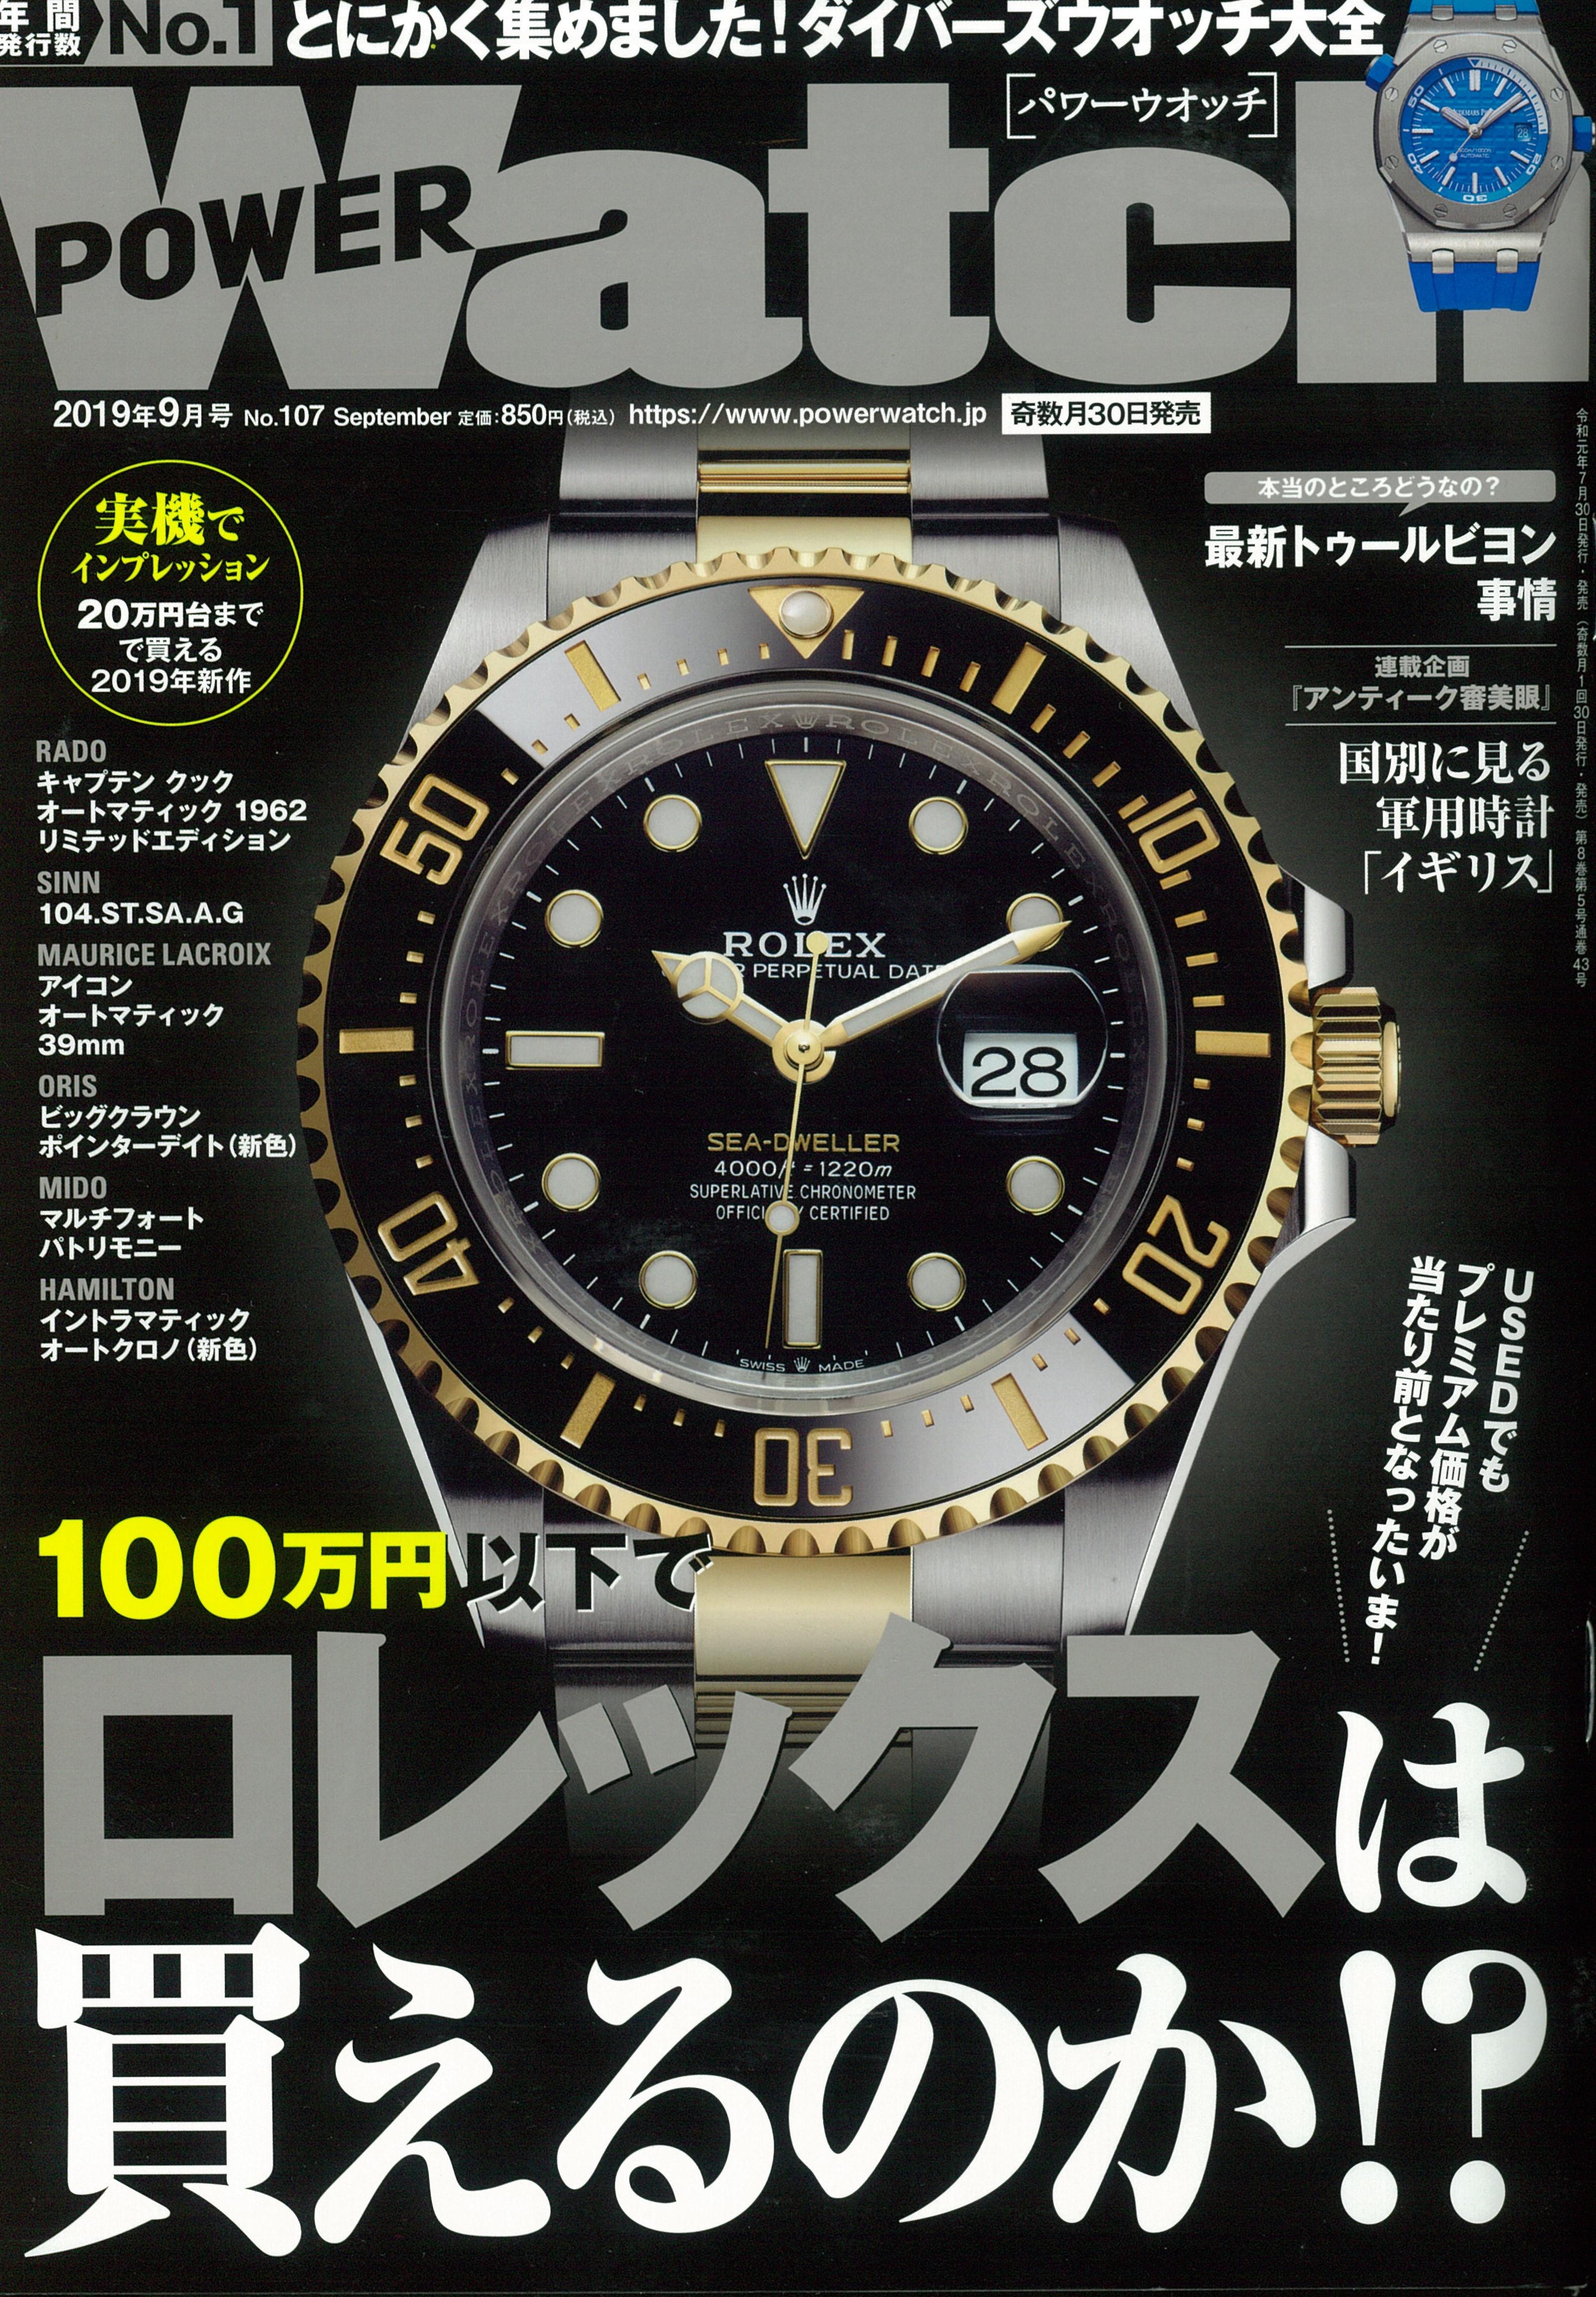 POWER Watch 9月号掲載